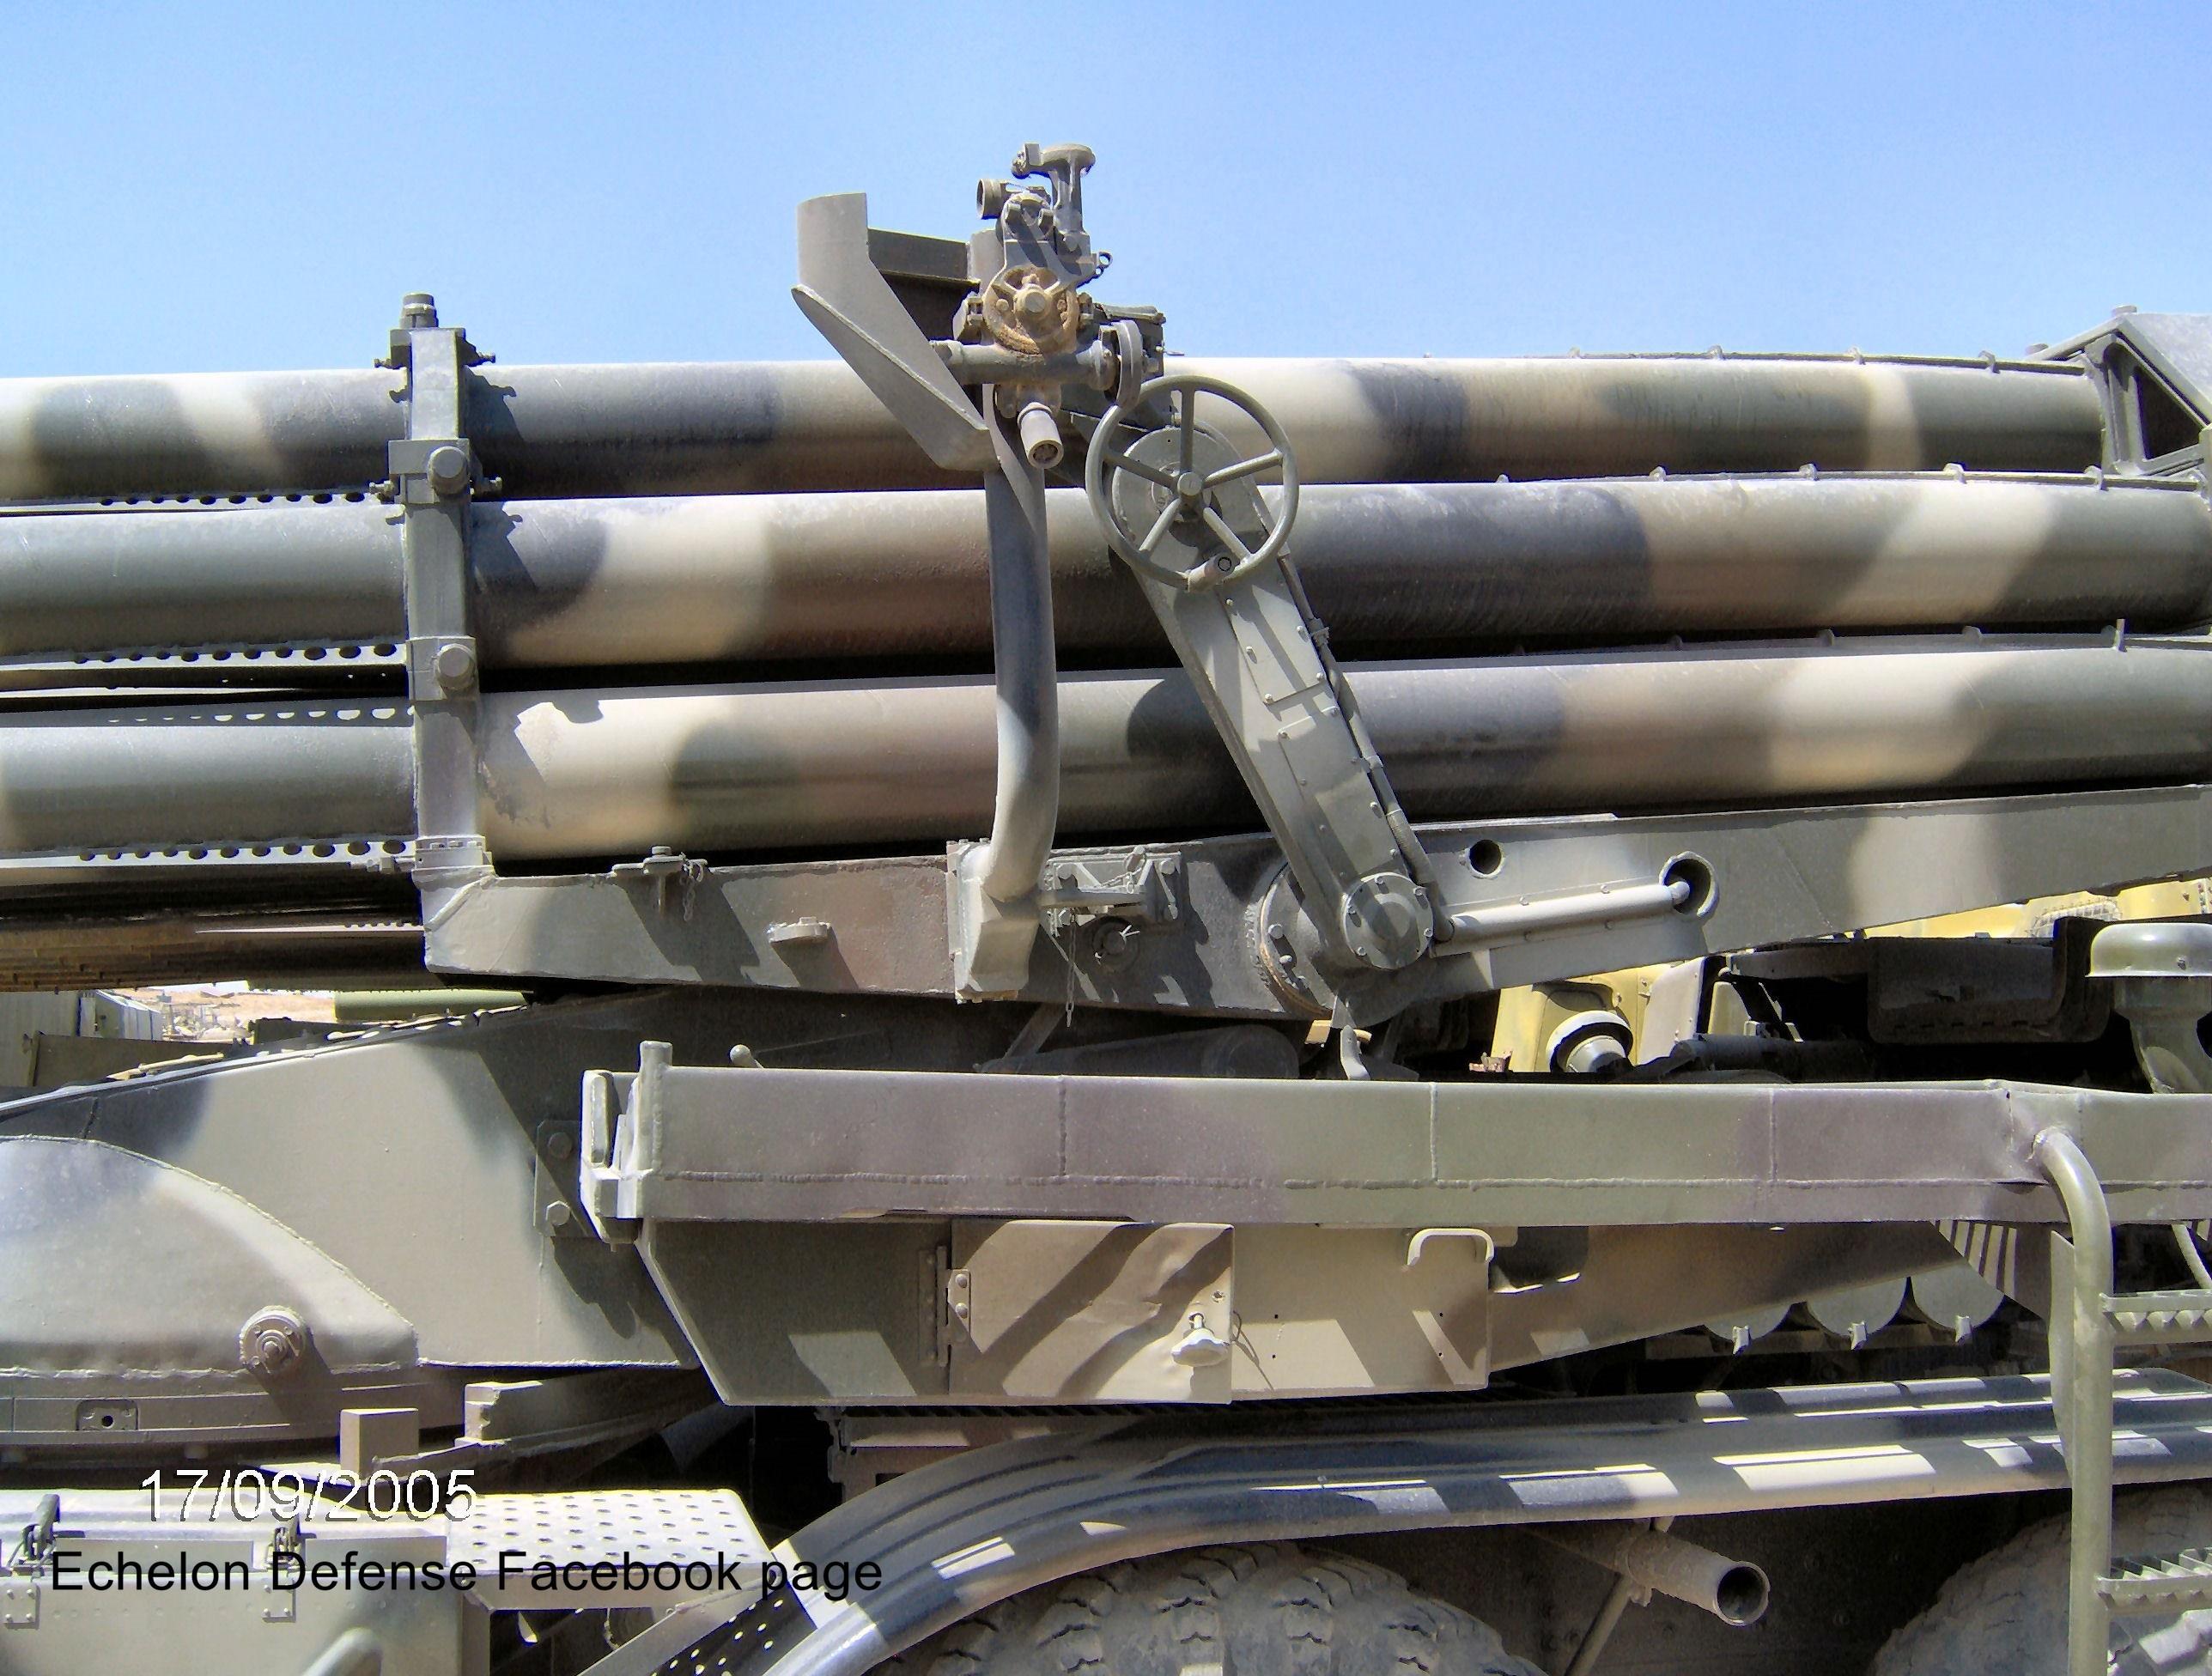 Russian MRLS: Grad, Uragan, Smerch, Tornado-G/S - Page 6 BAhG2e